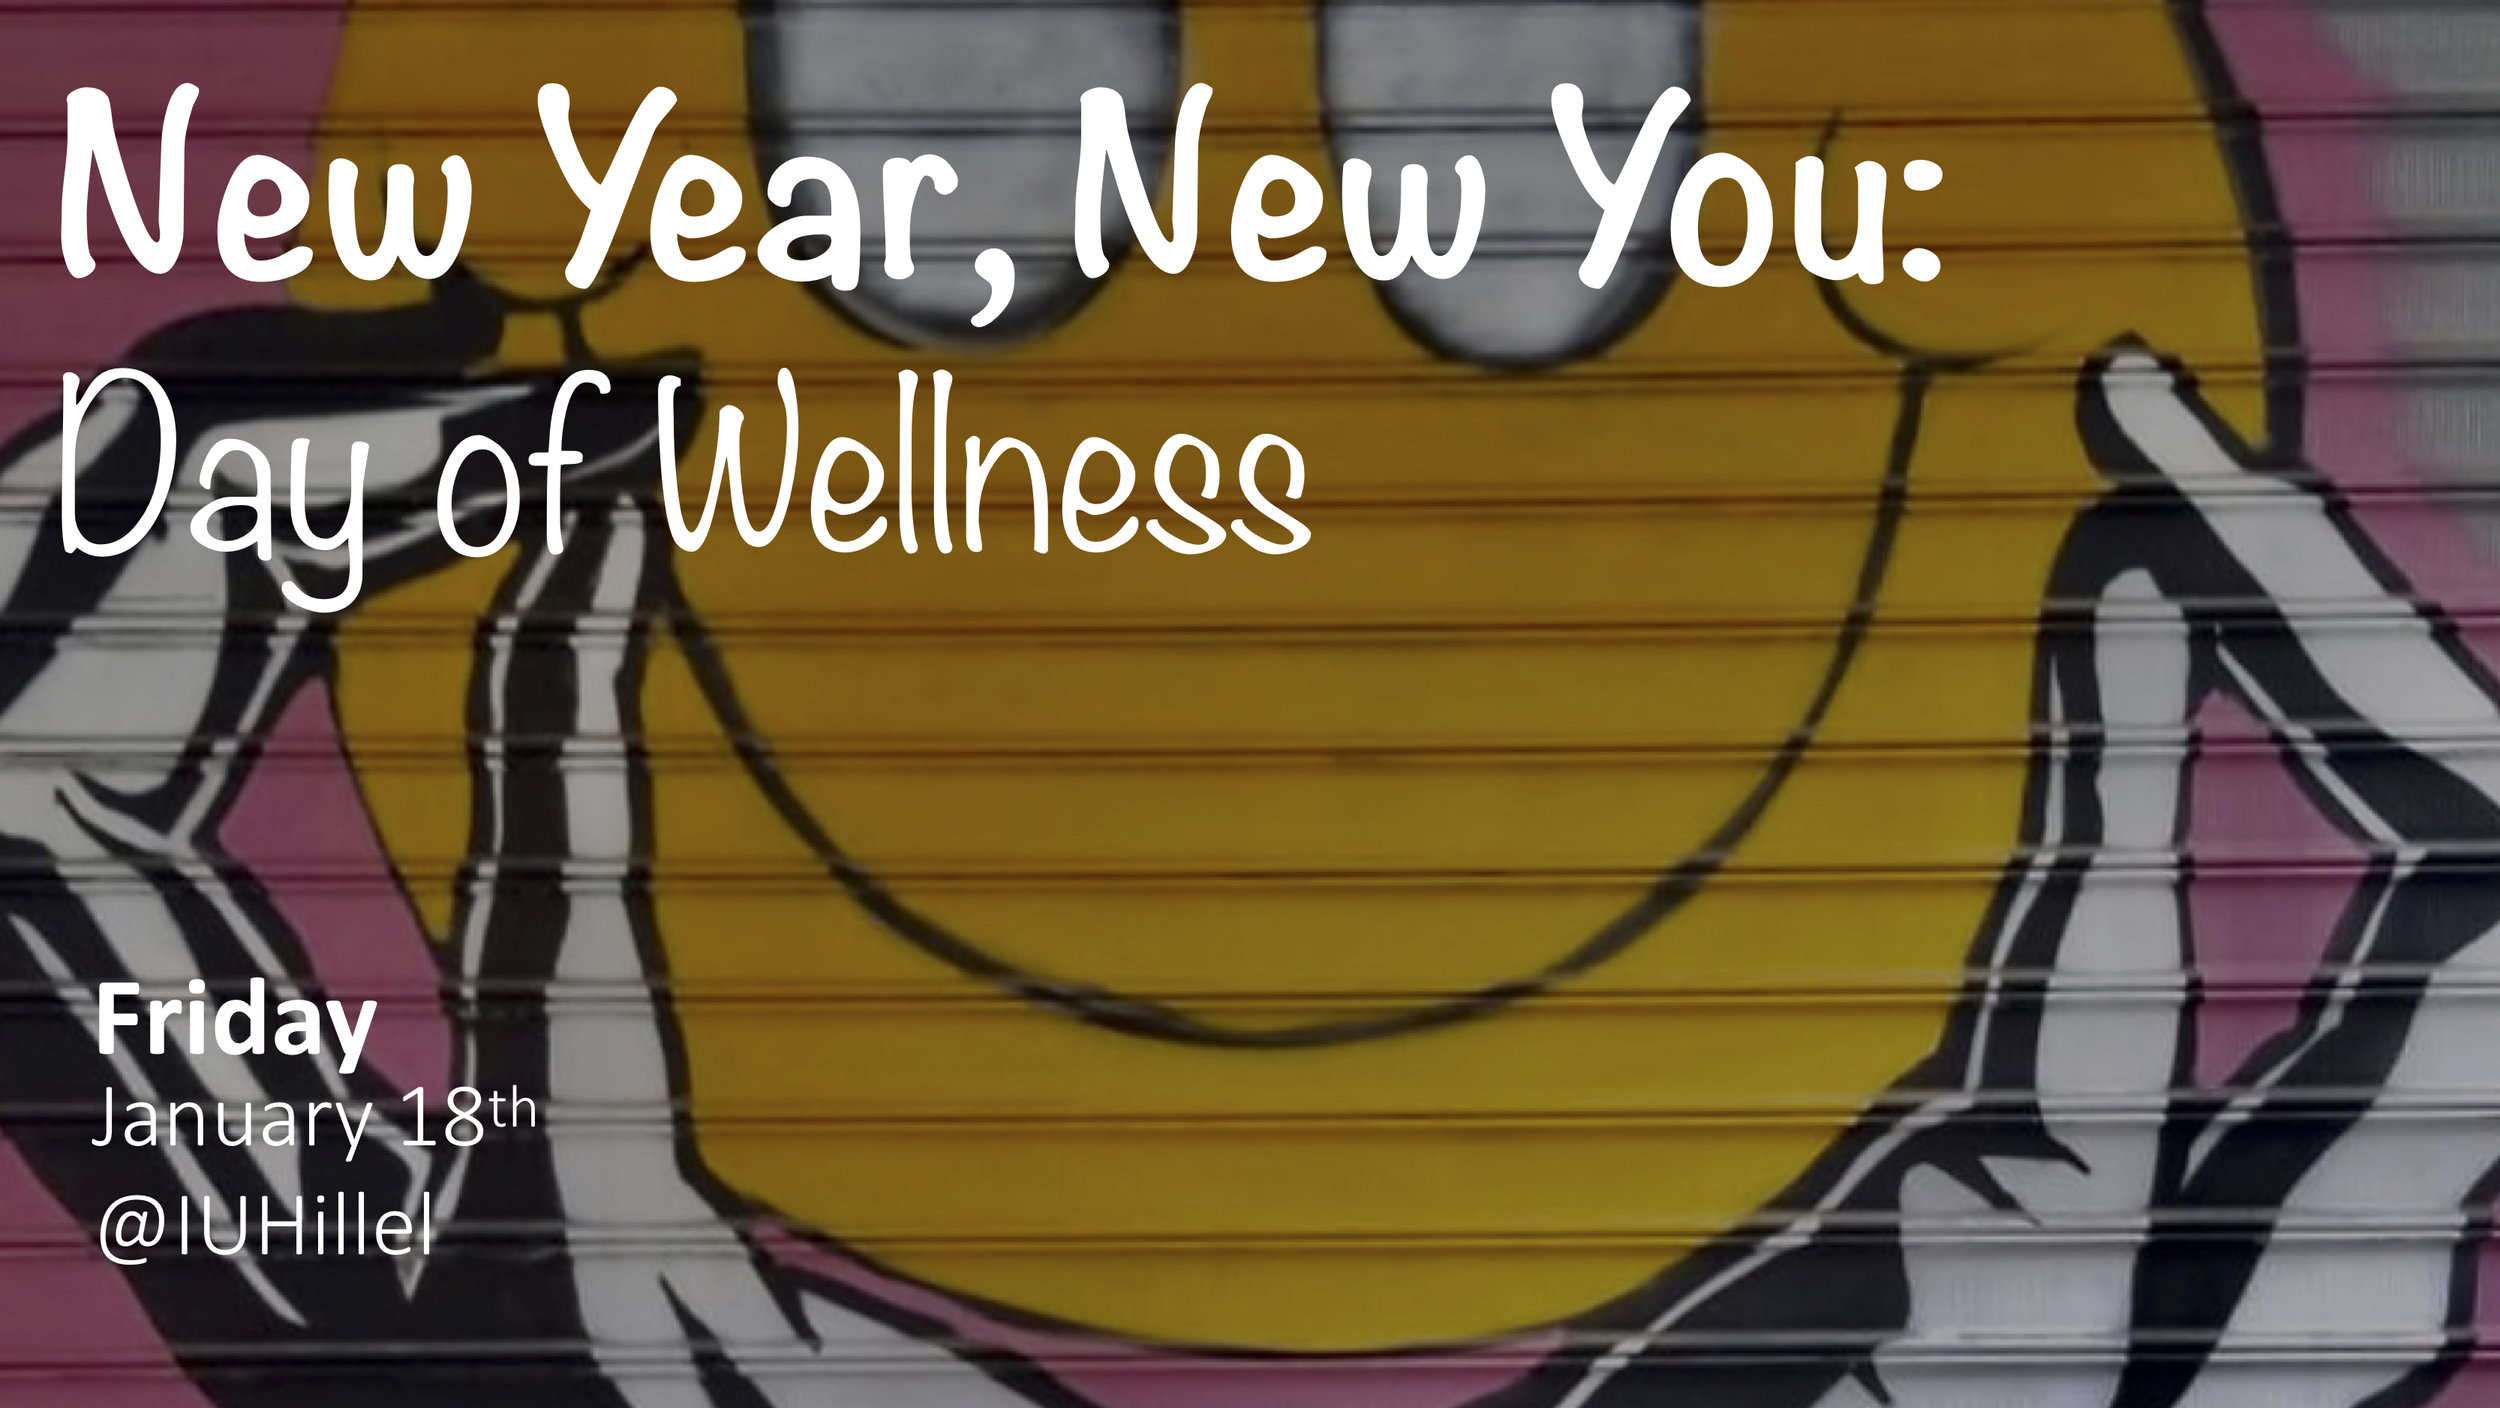 wellness day fb.jpg